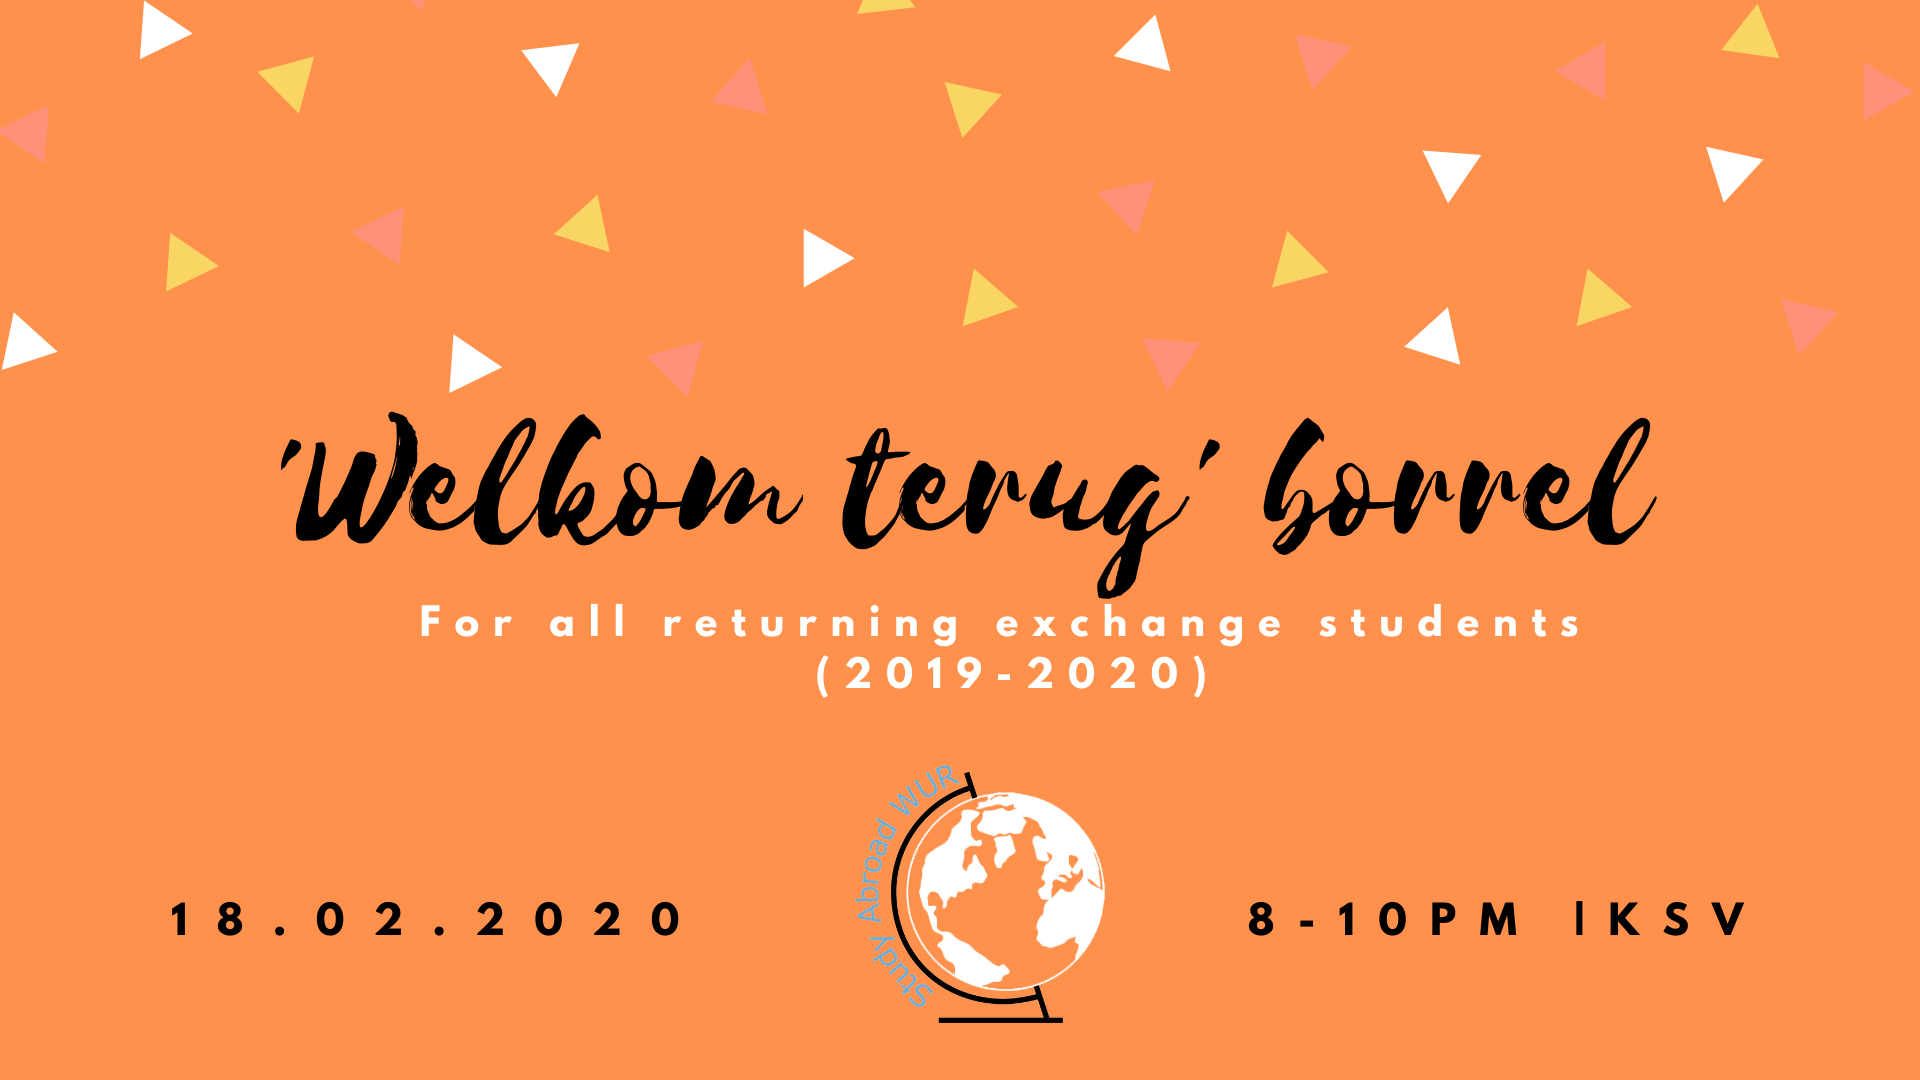 Welkom Terug Borrel - 18th of February